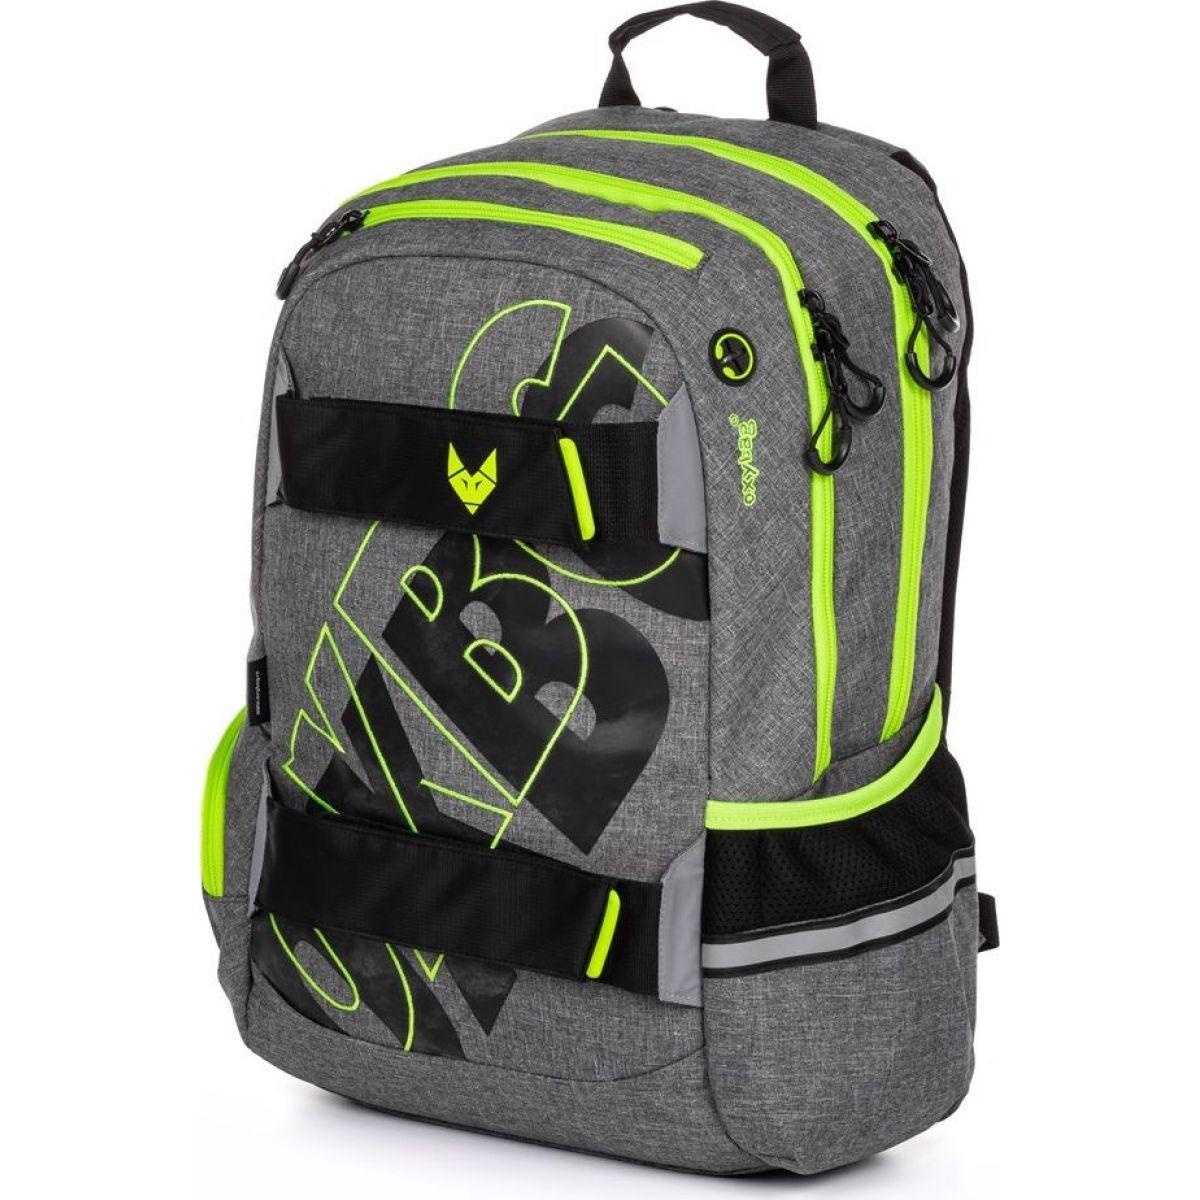 Karton P + P Študentský batoh Oxy Šport Grey Line green